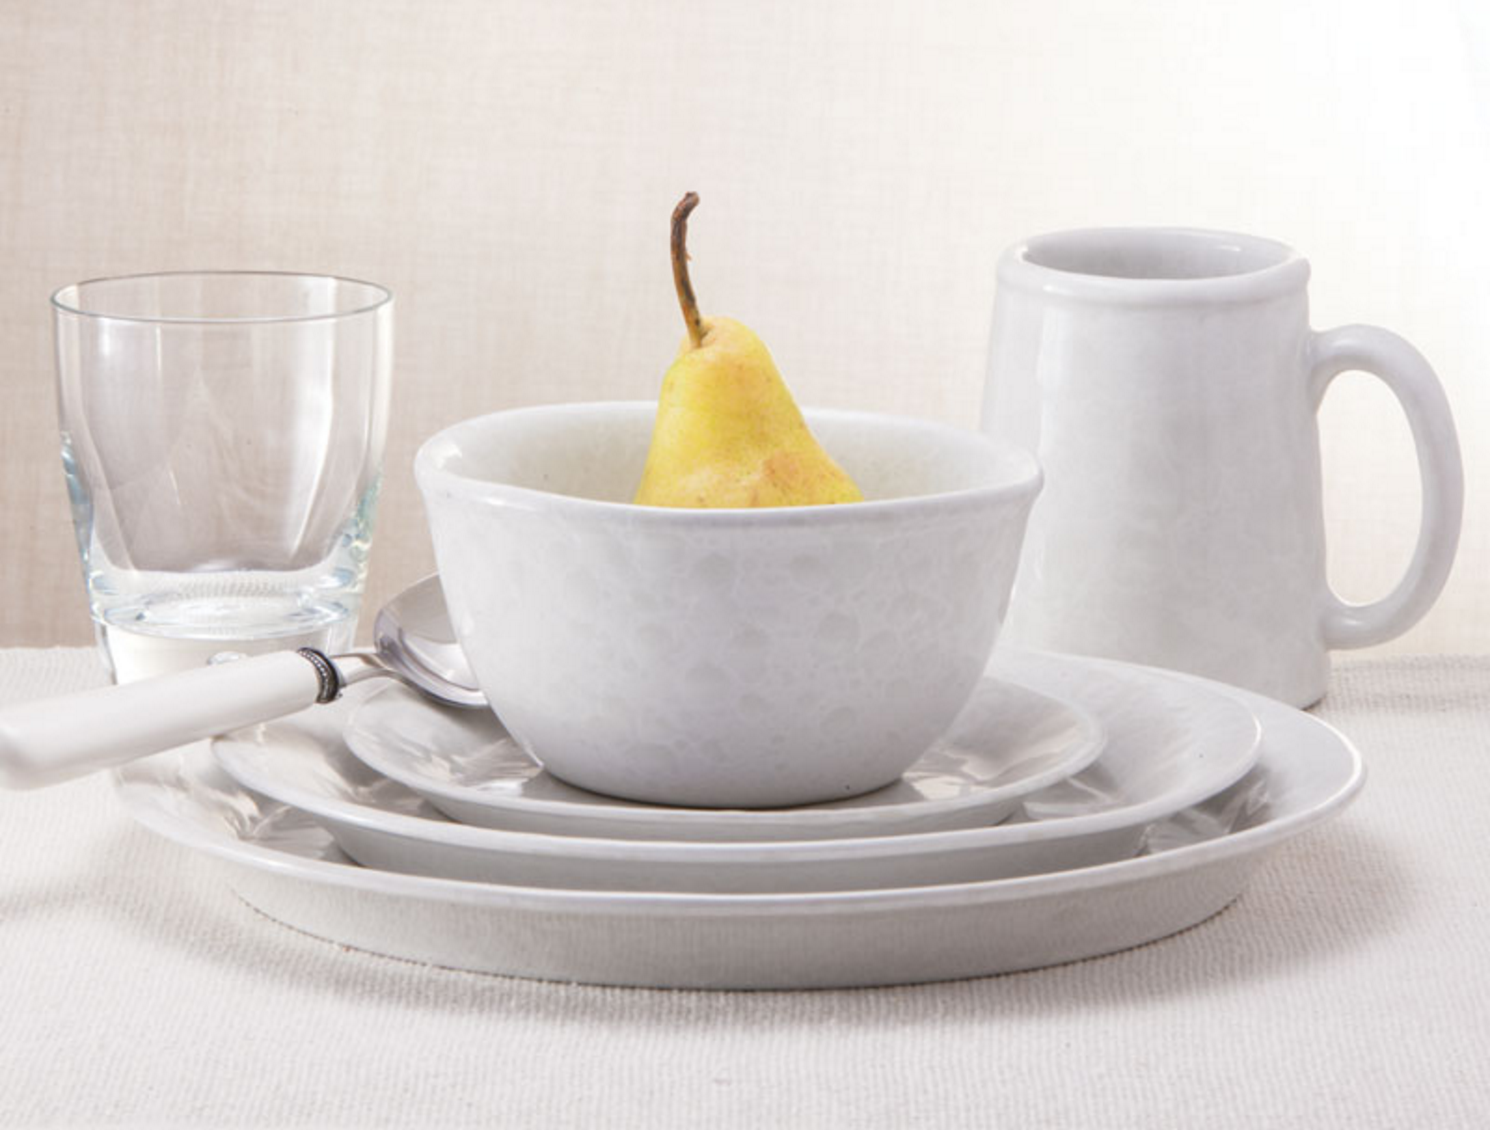 bennington-white-on-white-dinnerware-remodelista